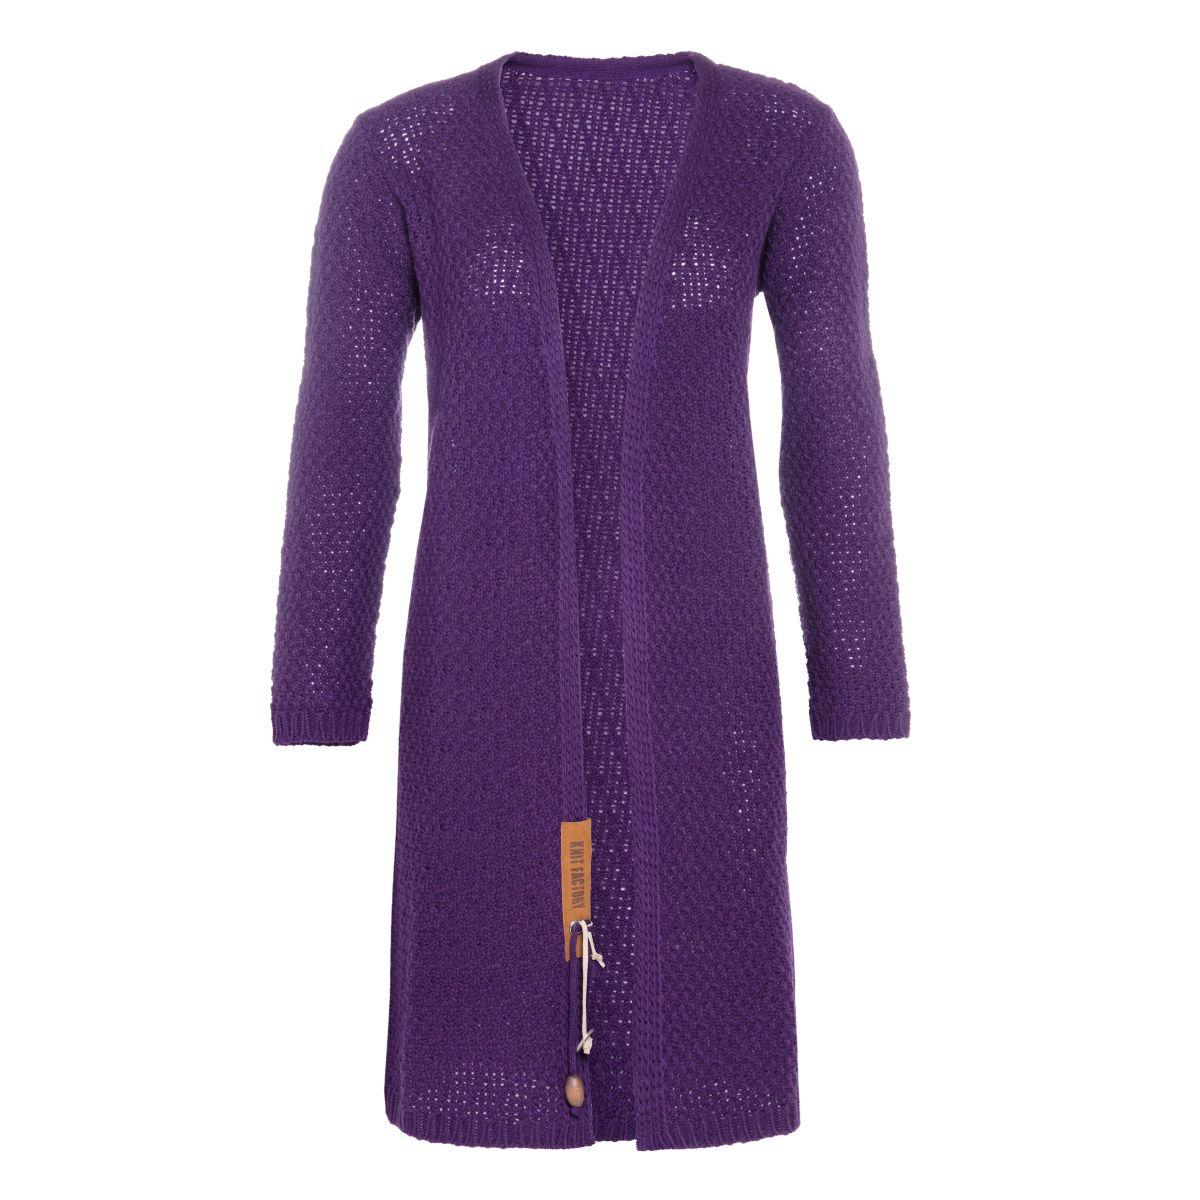 luna long knitted cardigan purple 3638